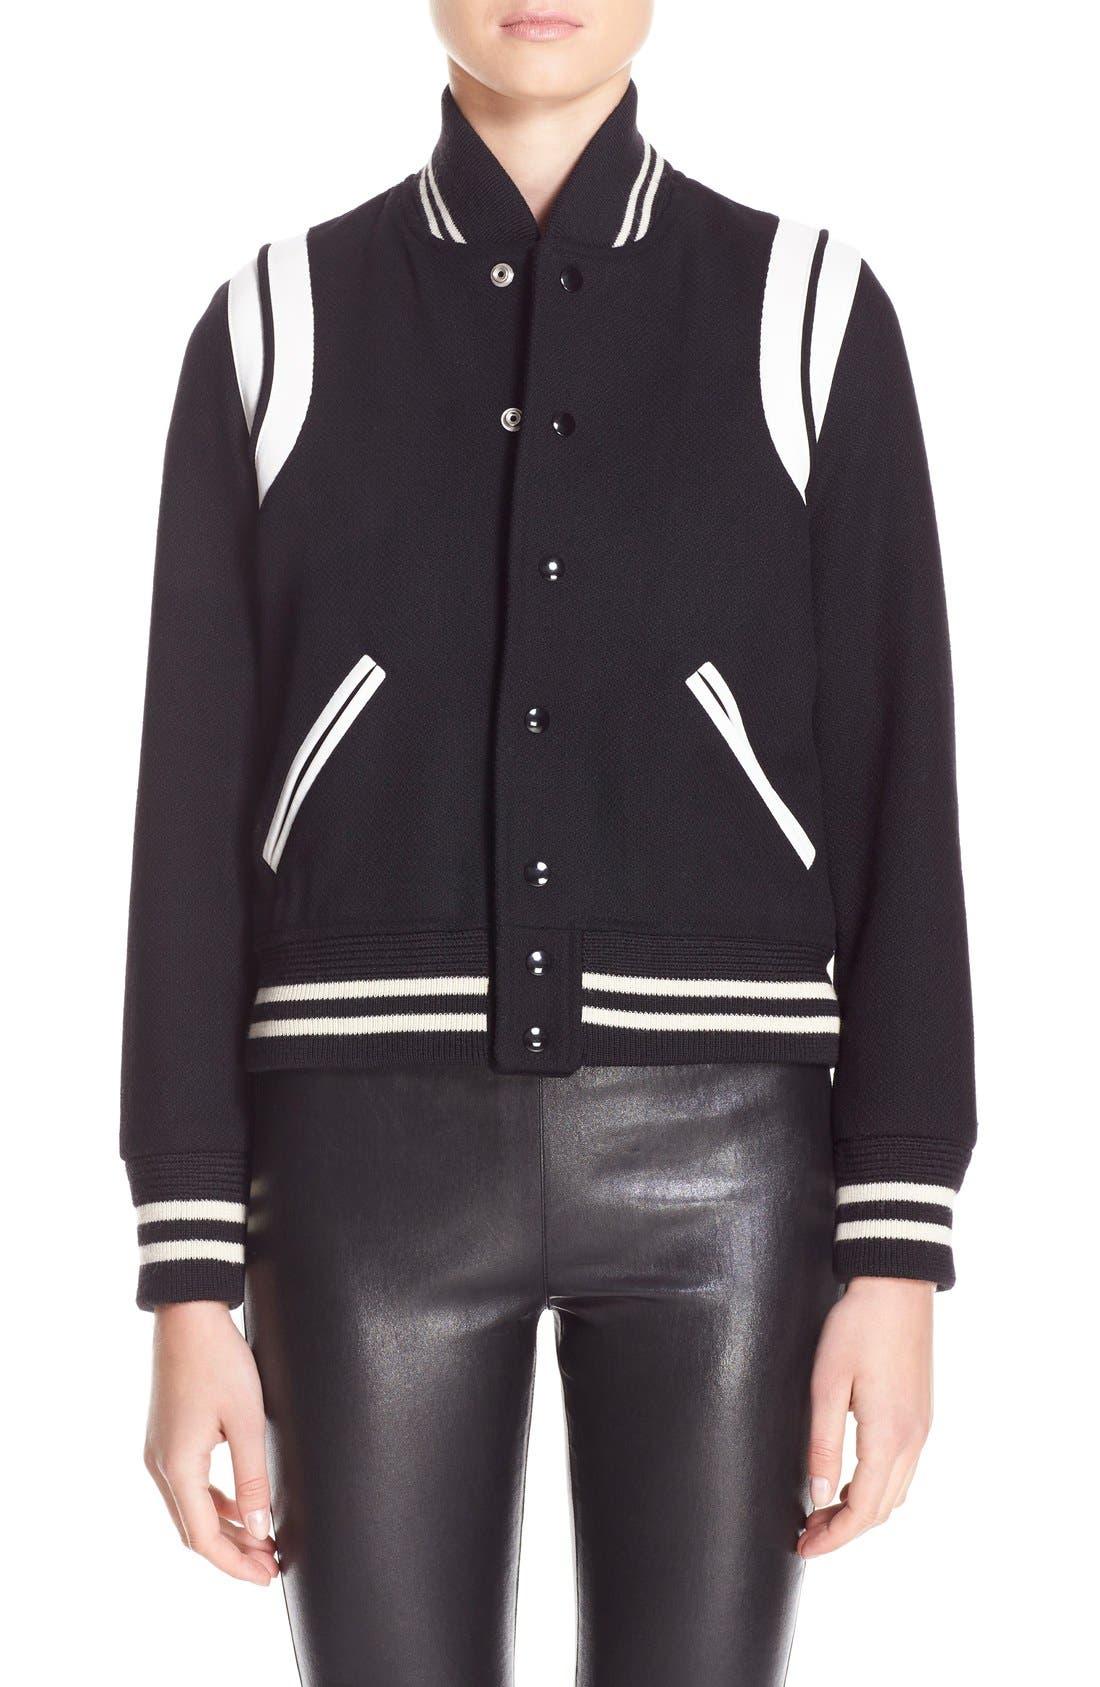 Alternate Image 1 Selected - Saint Laurent 'Teddy' White Leather Trim Bomber Jacket